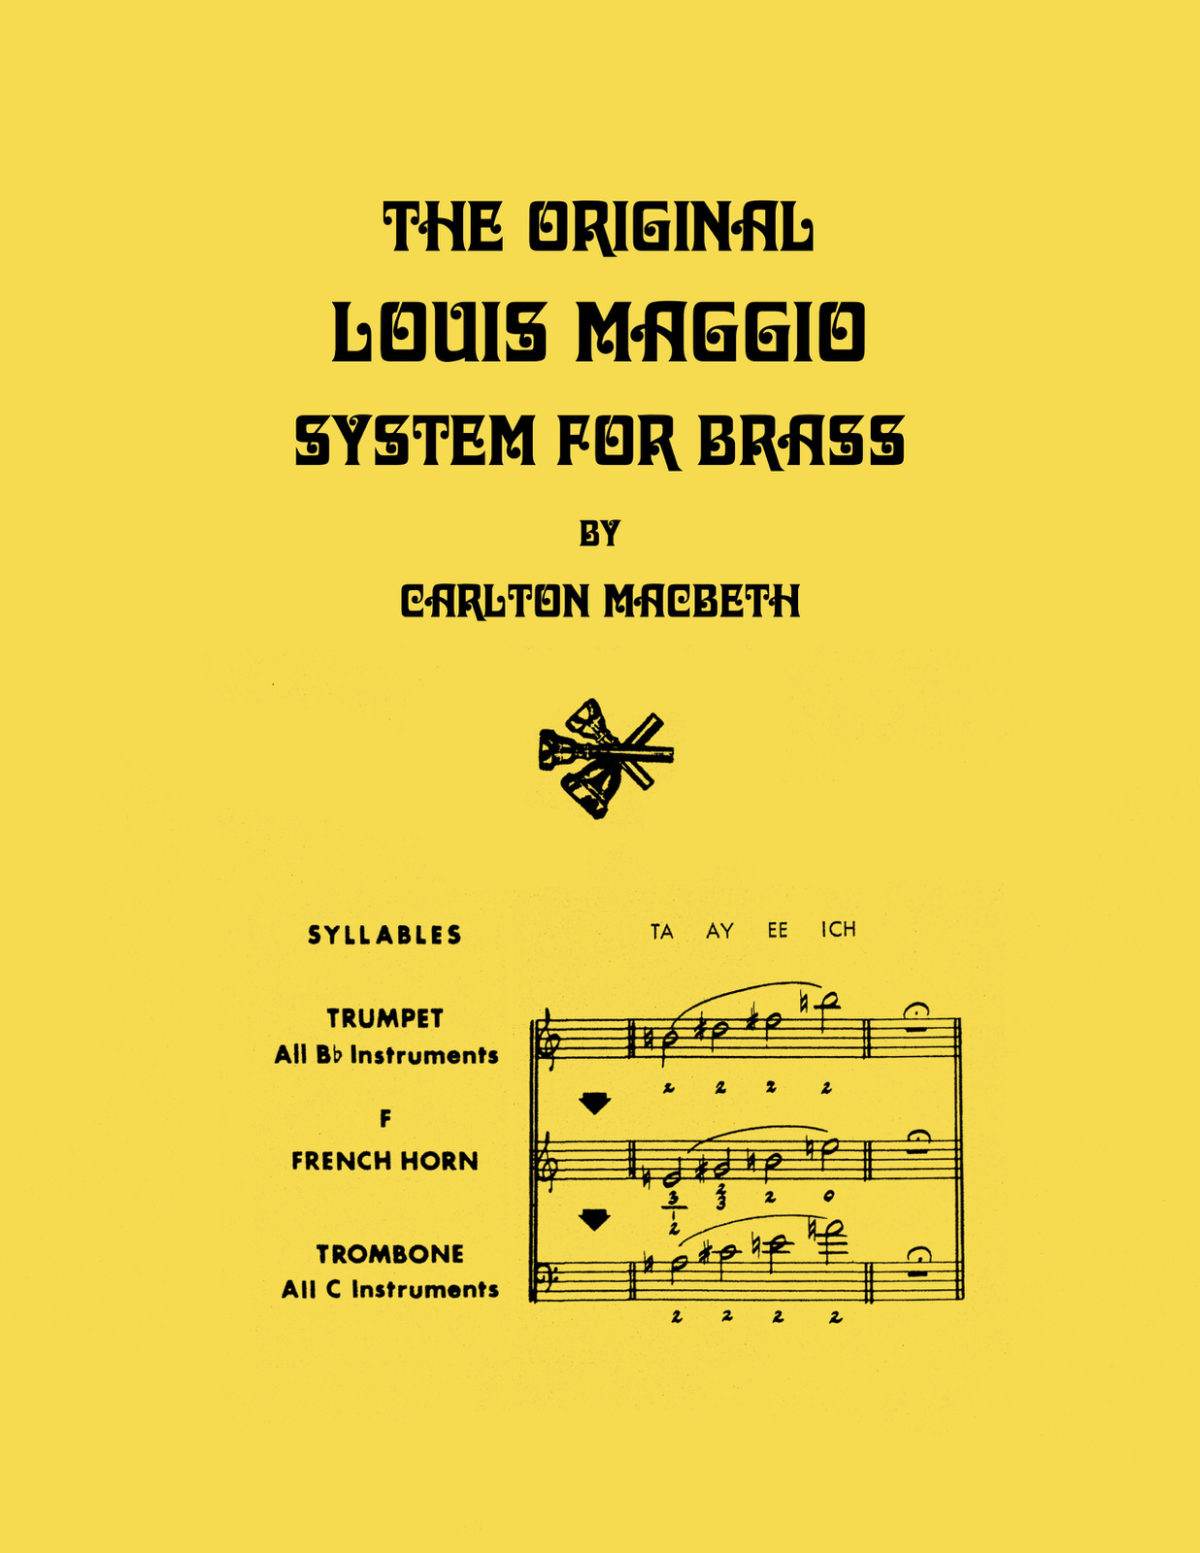 Macbeth, The Original Louis Maggio System for Brass